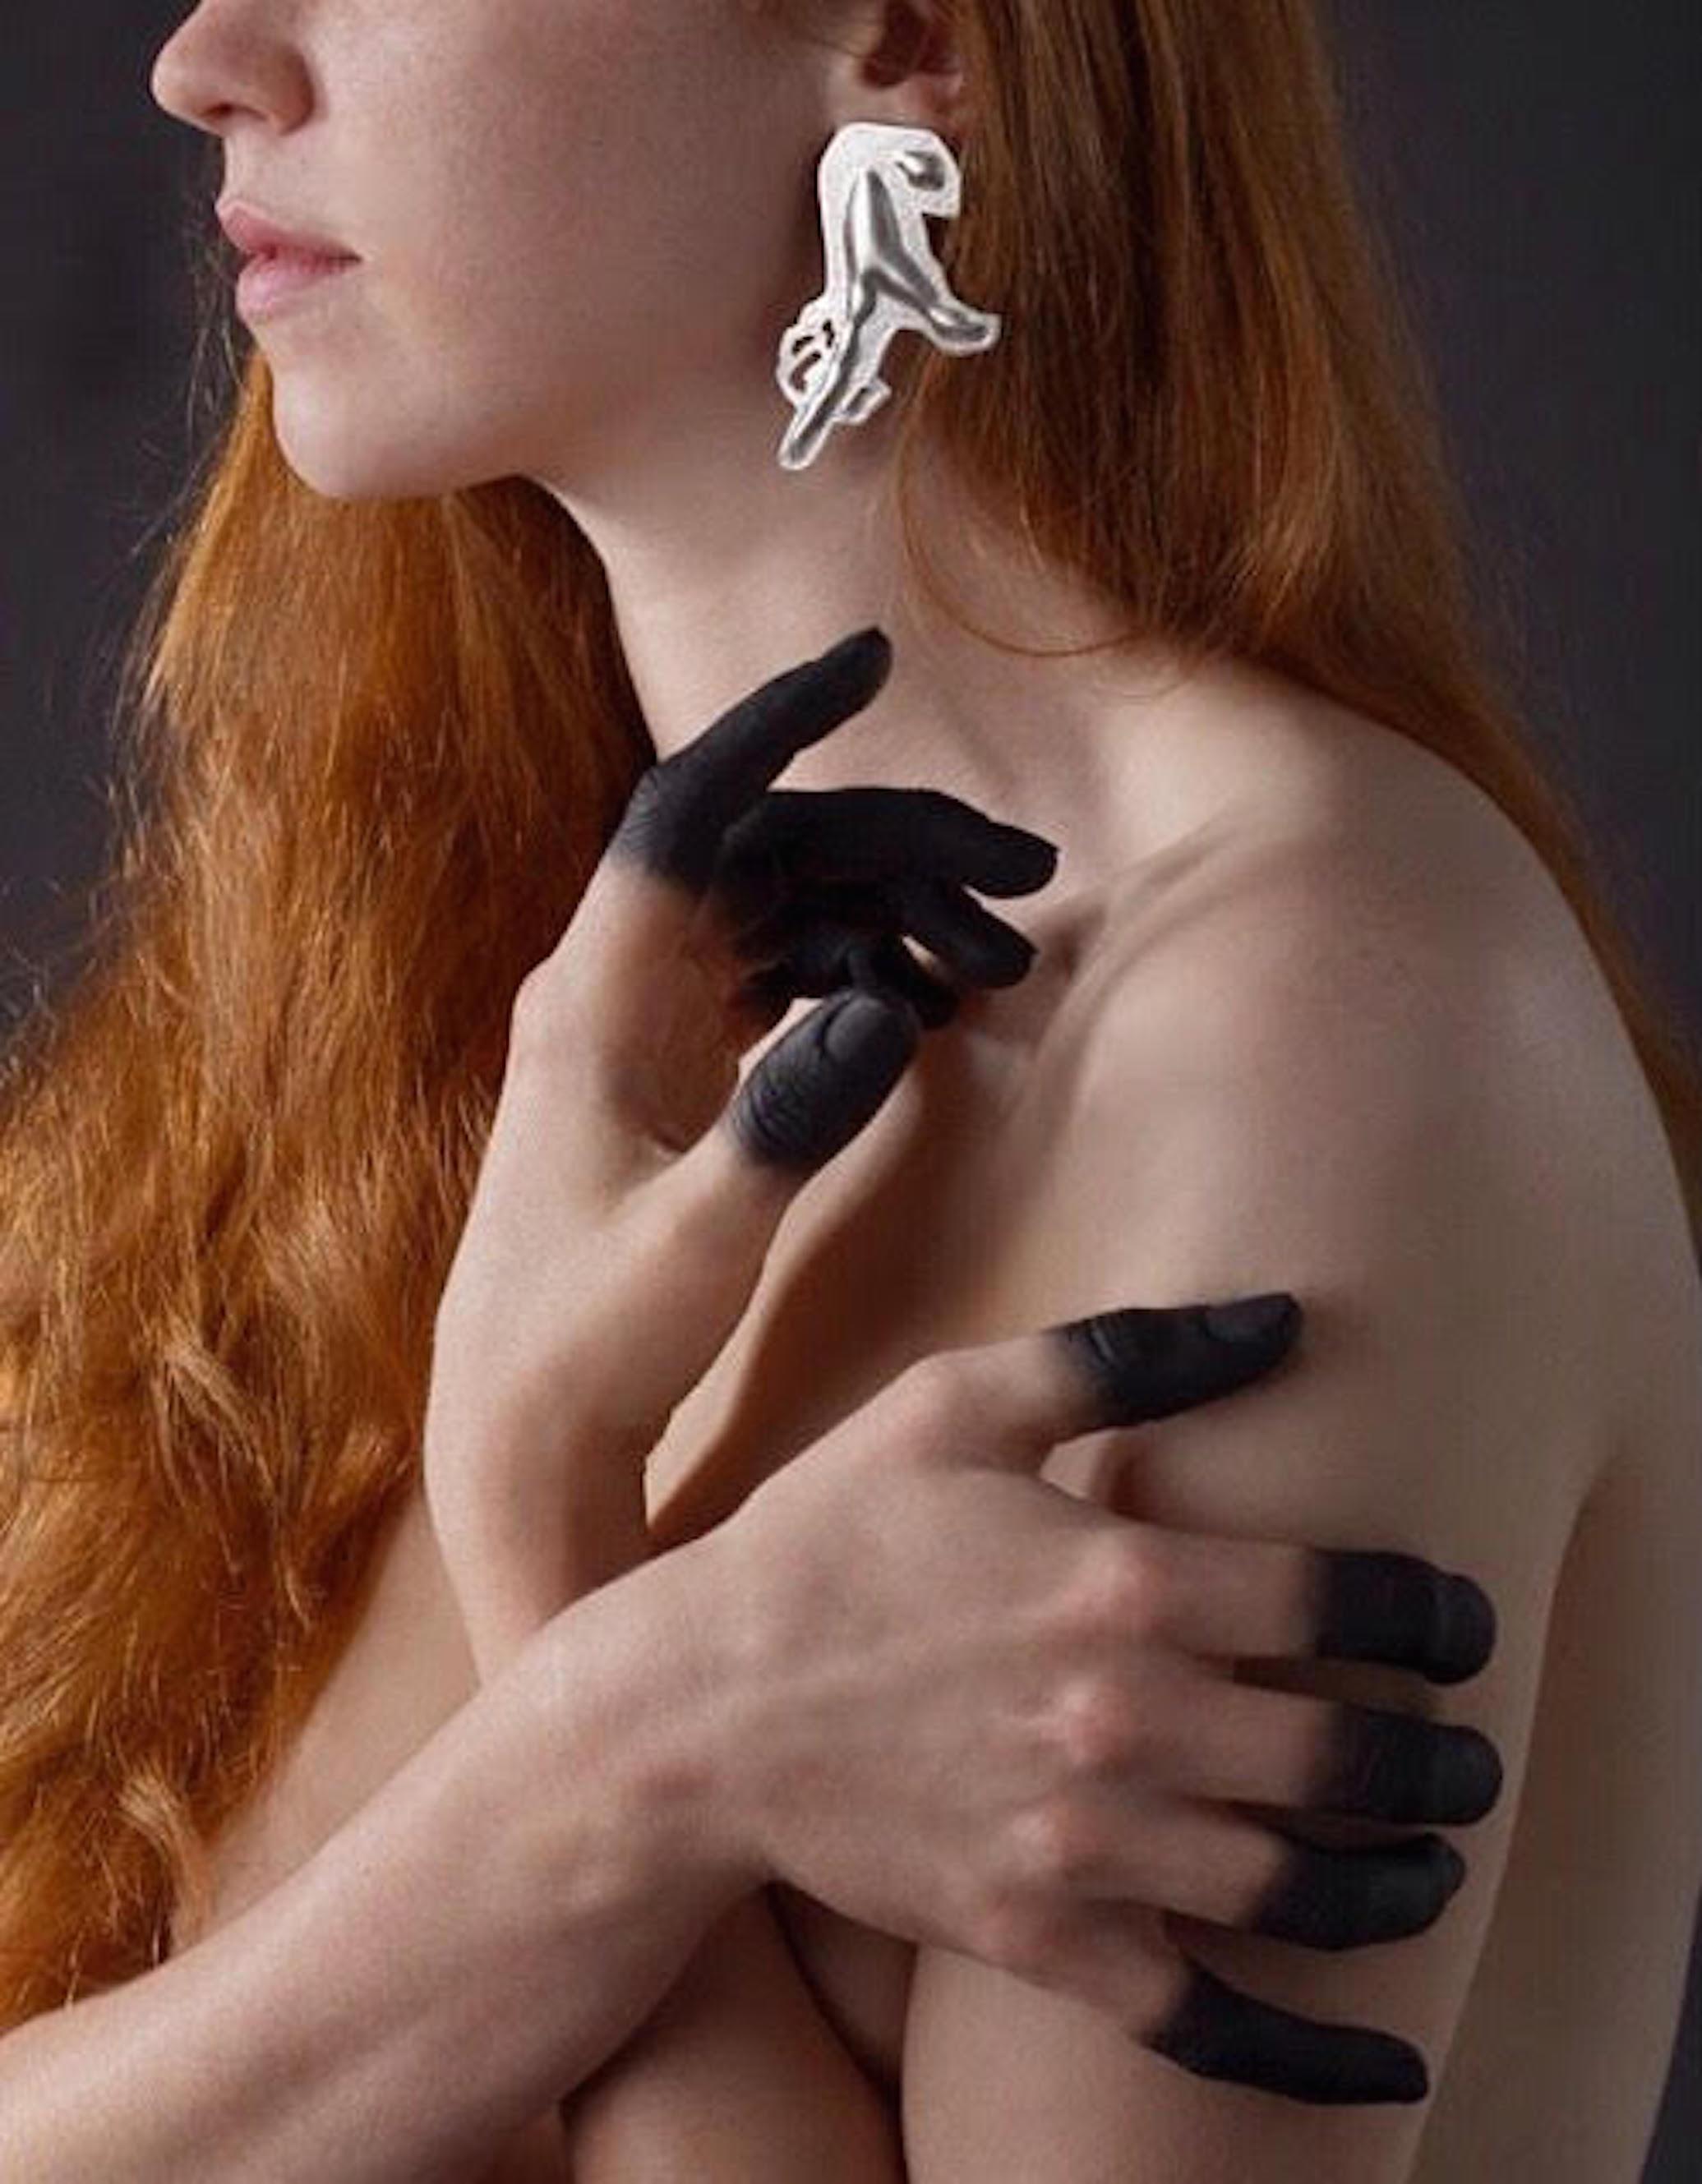 Gina Burgess Jewellery - Dancer's Hand Earrings.jpg